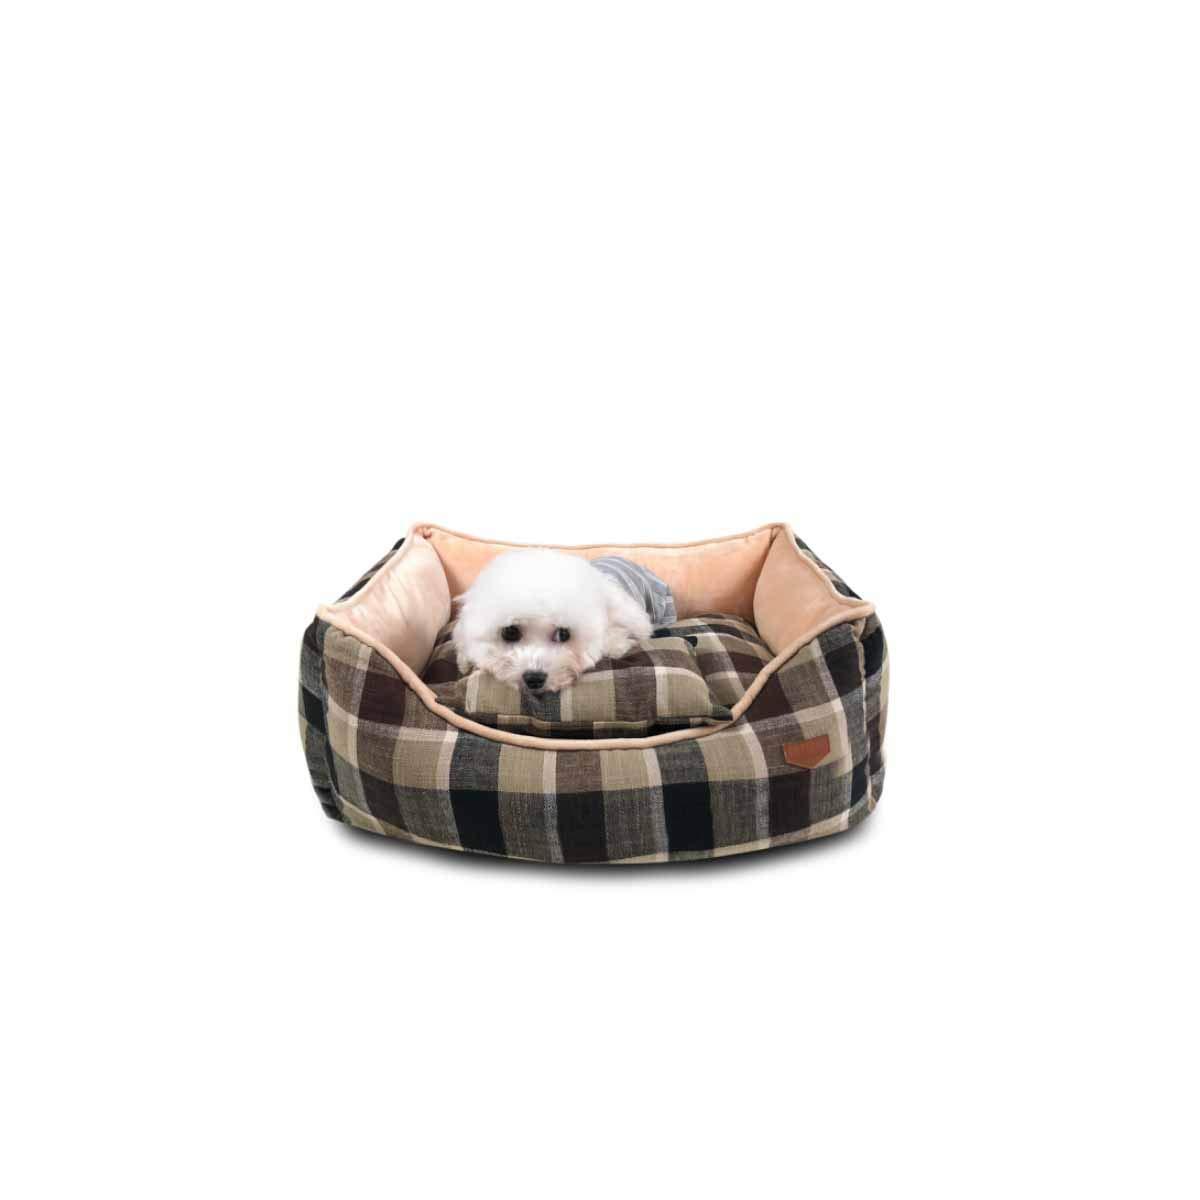 Brown S Brown S Muziwenju Kennel, Dog Mat, Warm Kennel, Winter Pet Nest, Winter Puppies, Small Dog Kennel, Winter Medium Kennel Kennel, Large Dog Kennel Big Kennel, golden Retriever Kennel, Removable CatKennel,